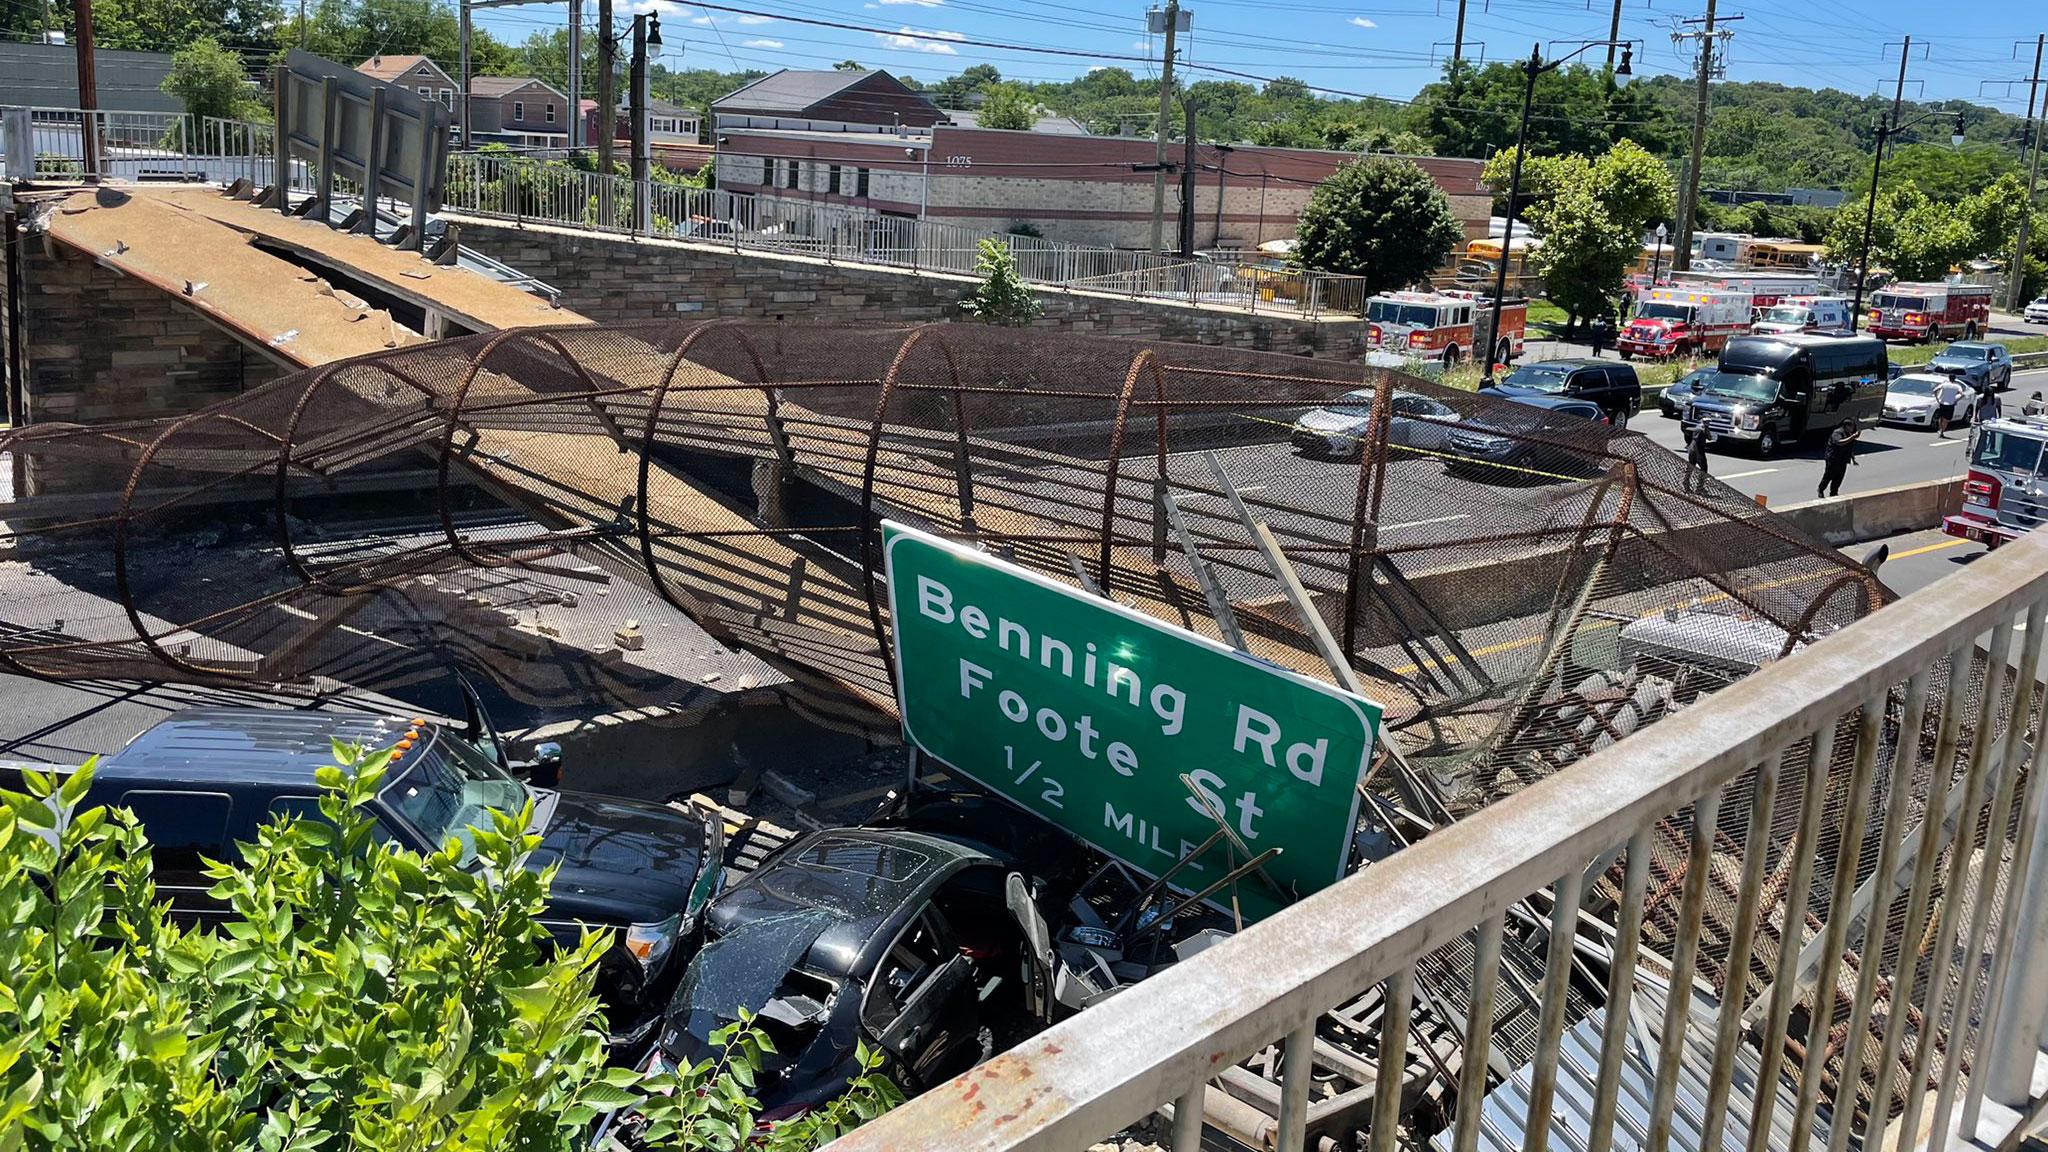 Pedestrian bridge collapses onto DC freeway, injuring several people